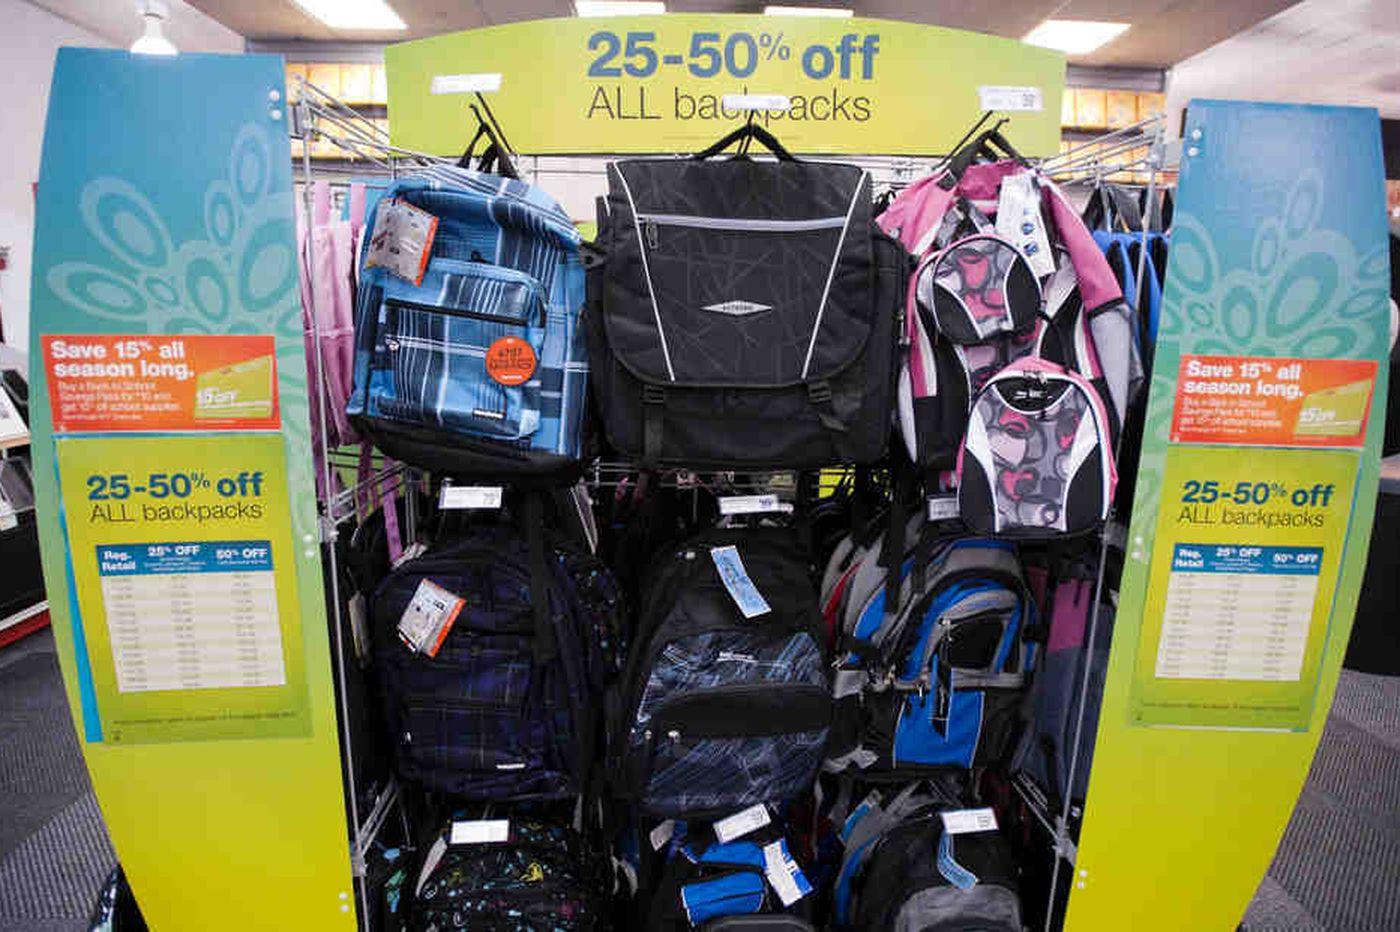 Jeff Gelles: Ace back-to-school shopping